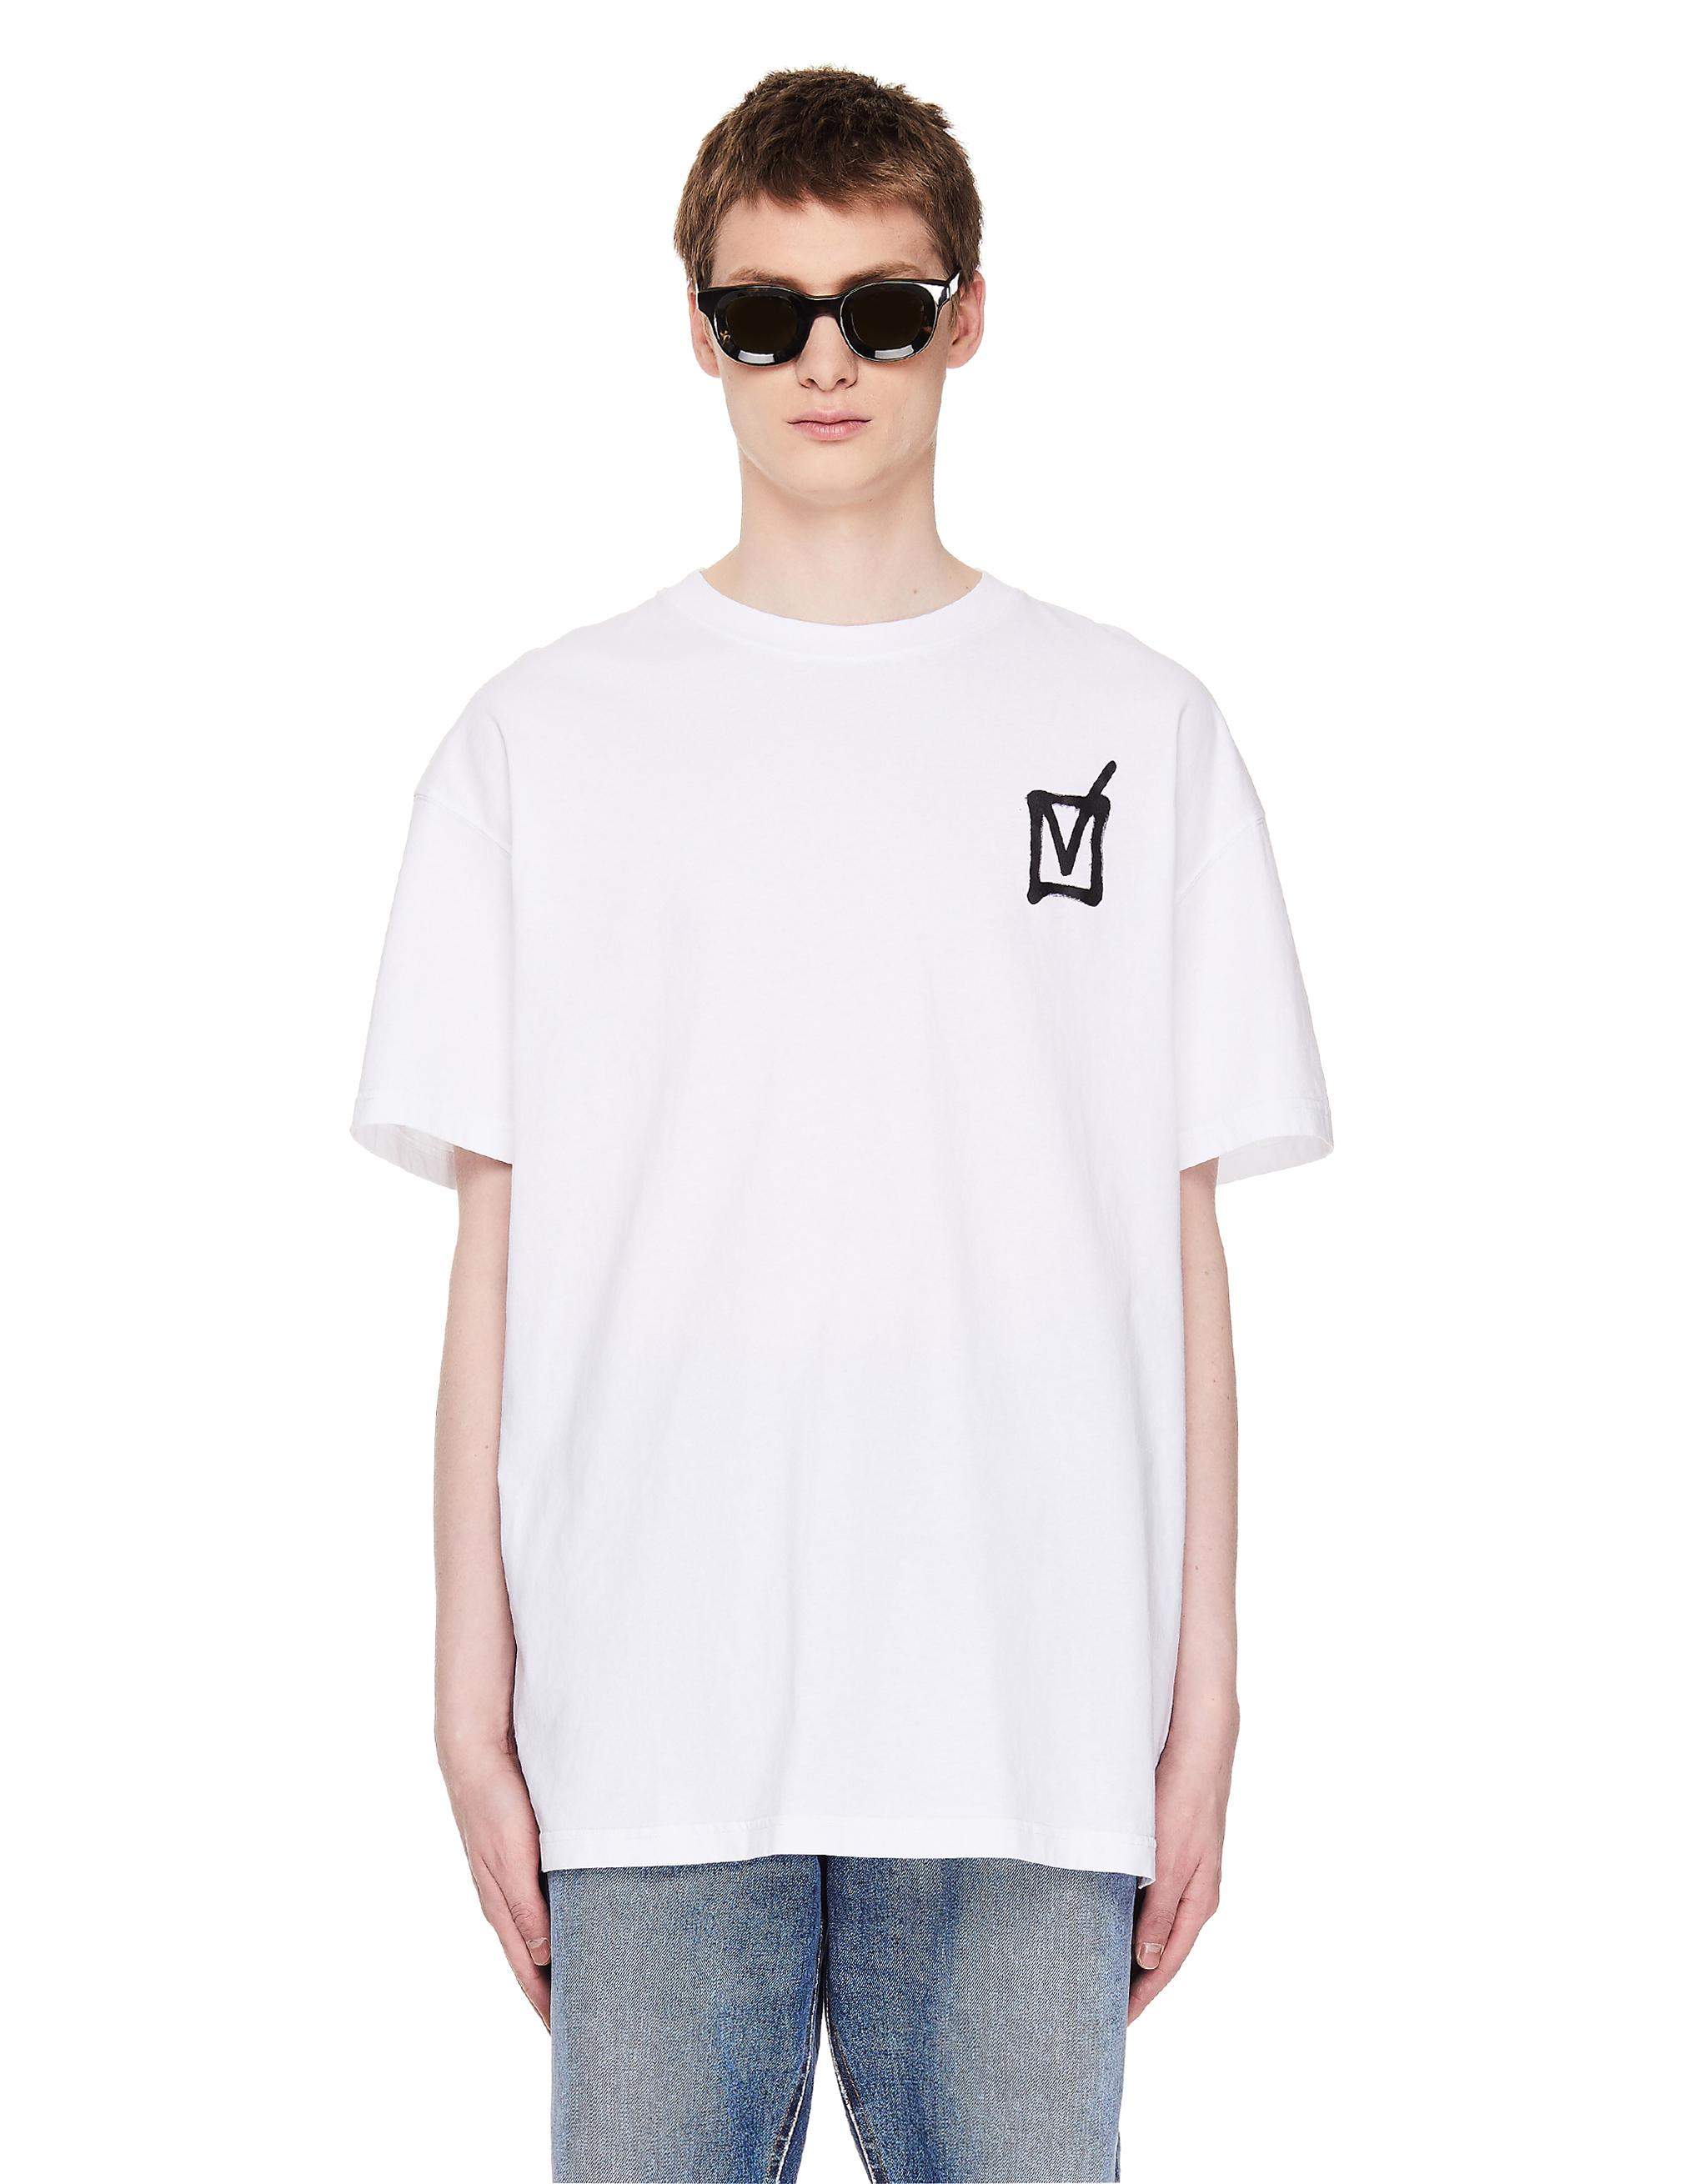 Vetements White Printed T-Shirt